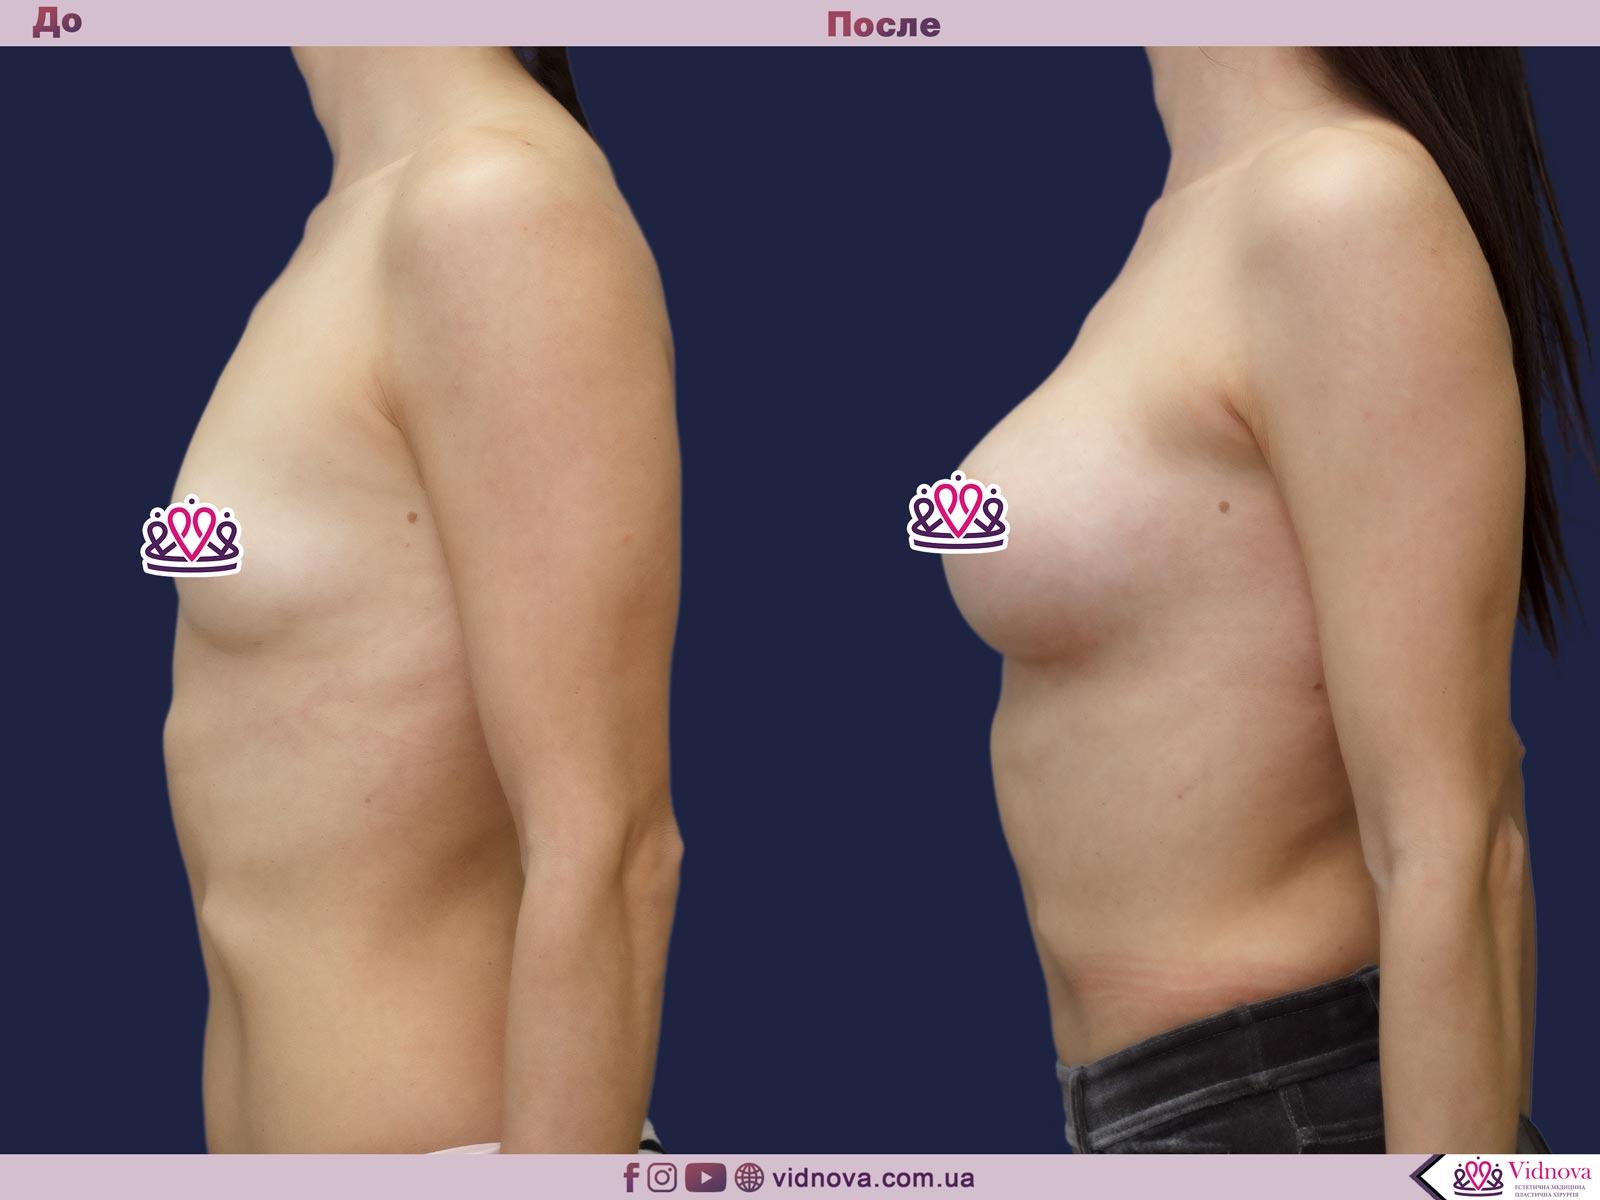 Увеличение груди: Фото ДО и ПОСЛЕ - Пример №75-3 - Клиника Vidnova